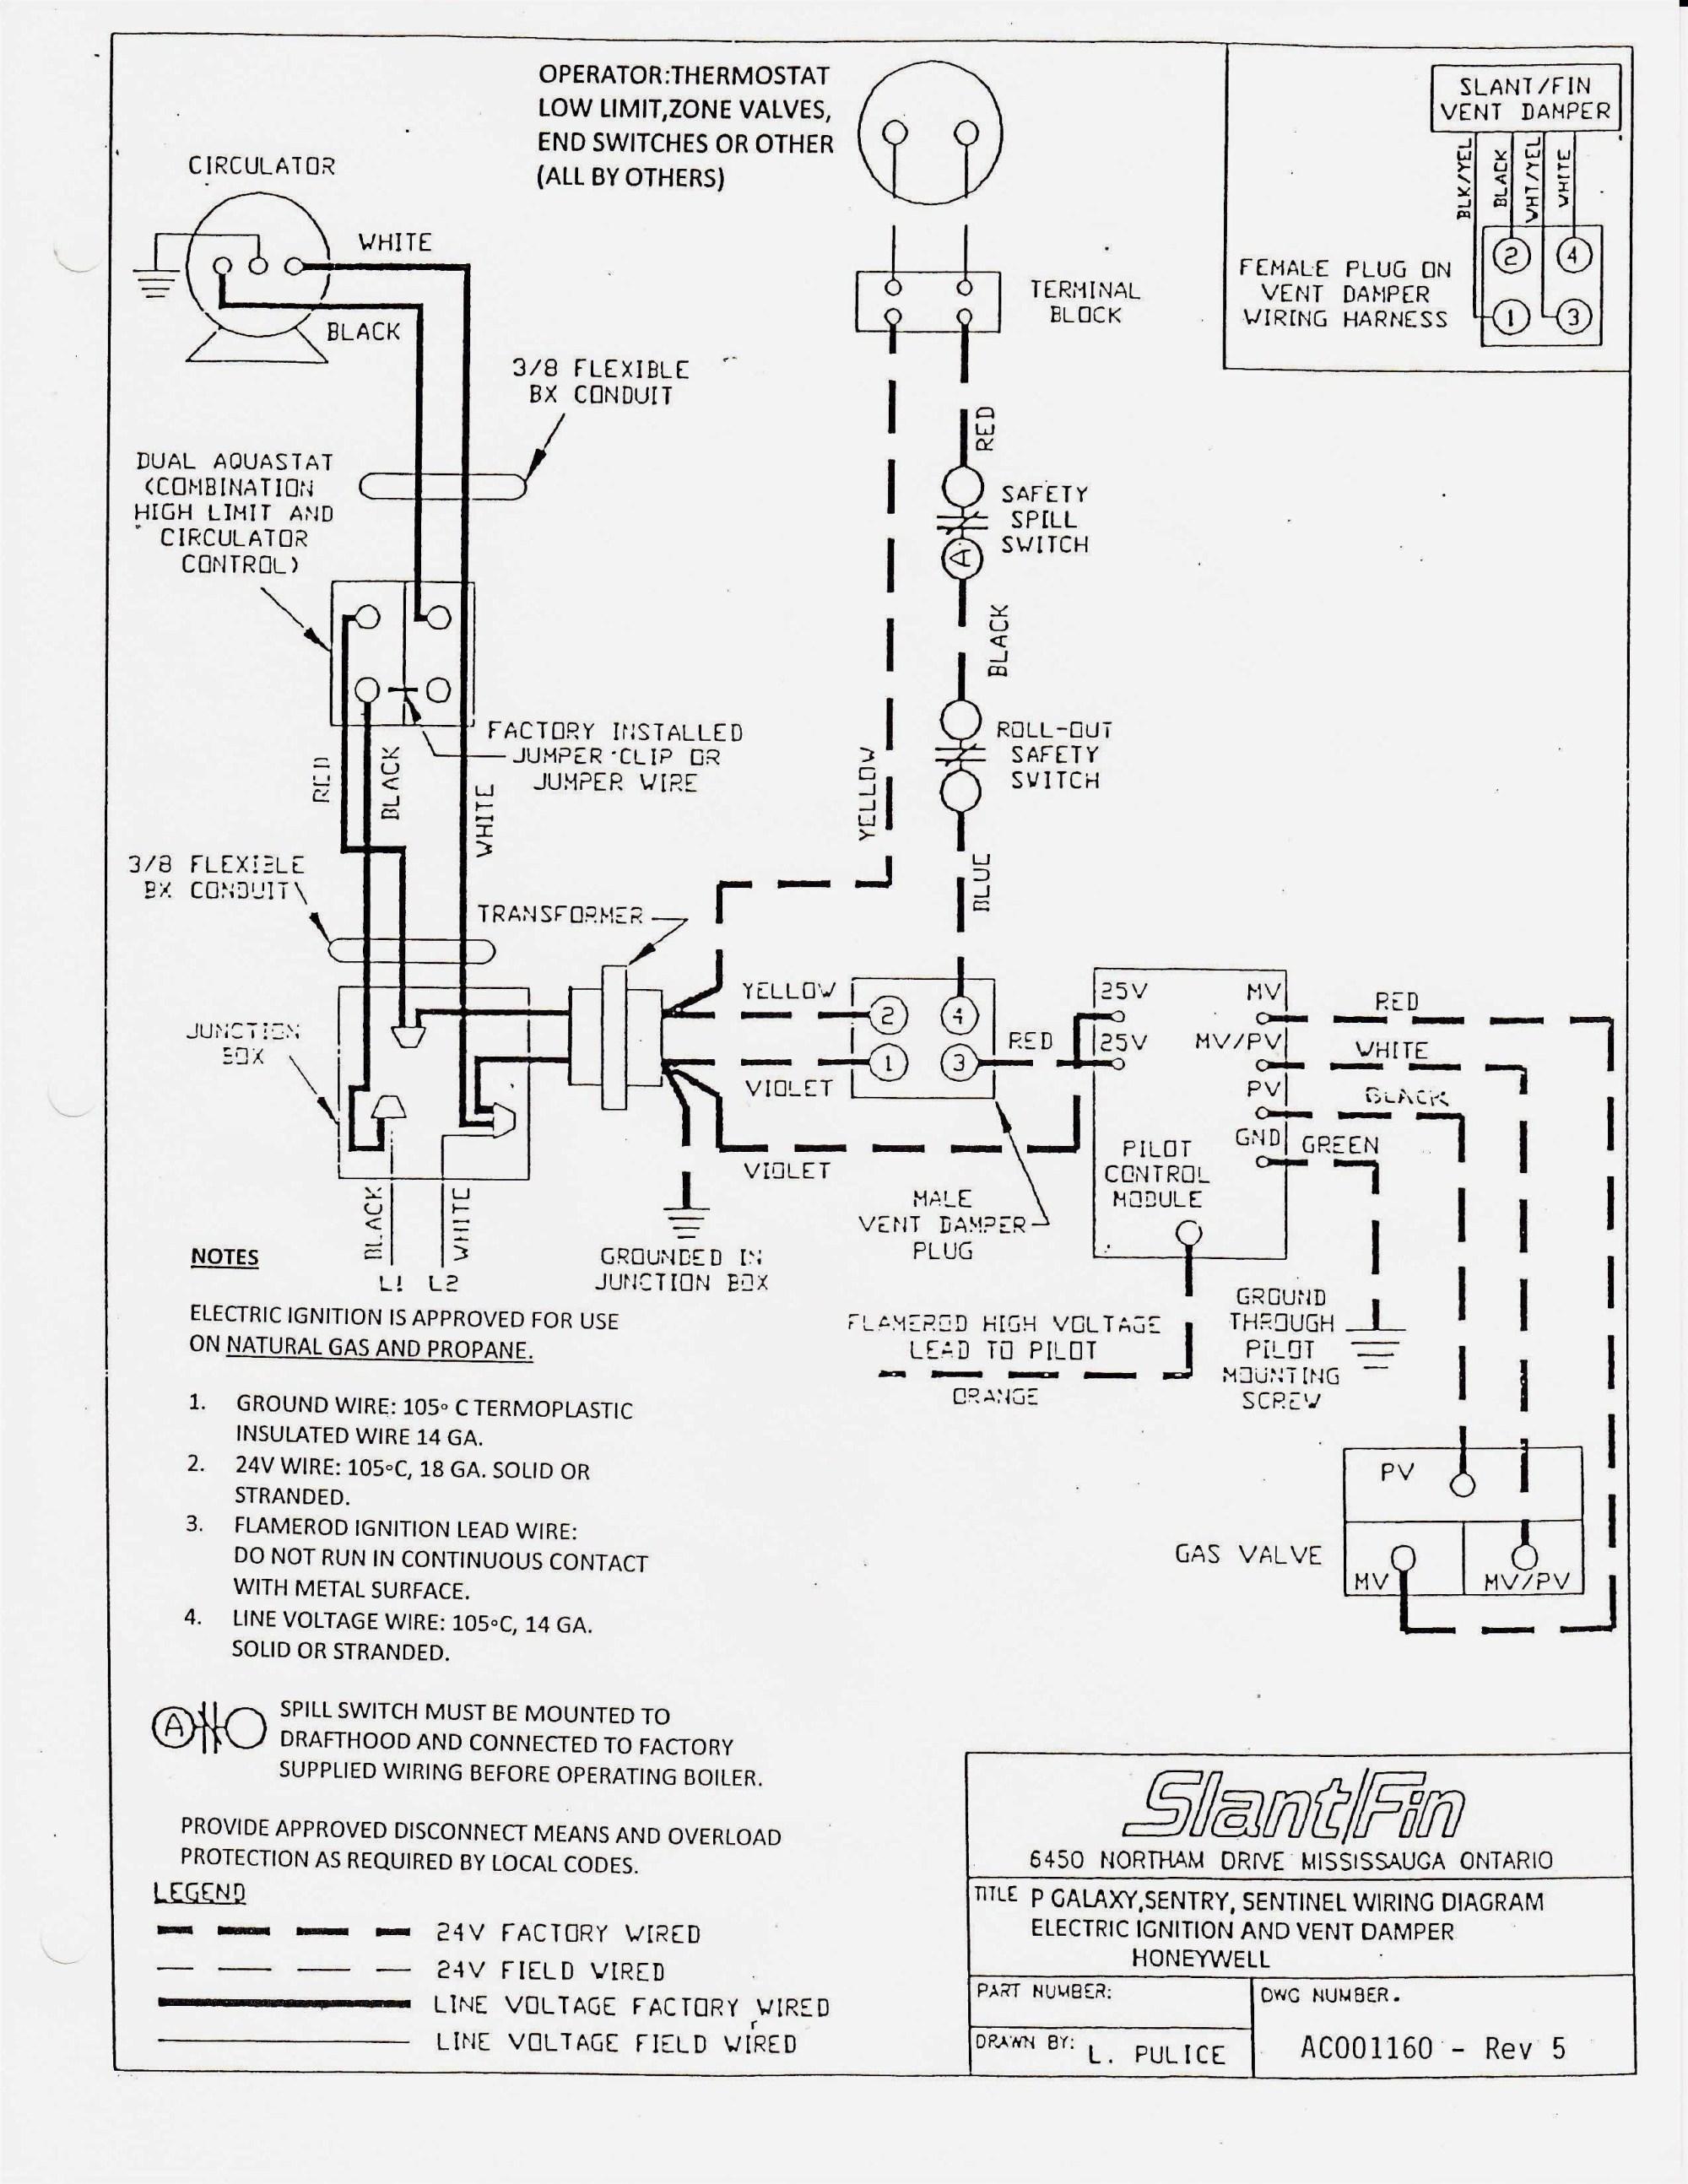 hight resolution of honeywell fan limit switch wiring diagram honeywell fan limit switch wiring diagram unique honeywell fan furnace